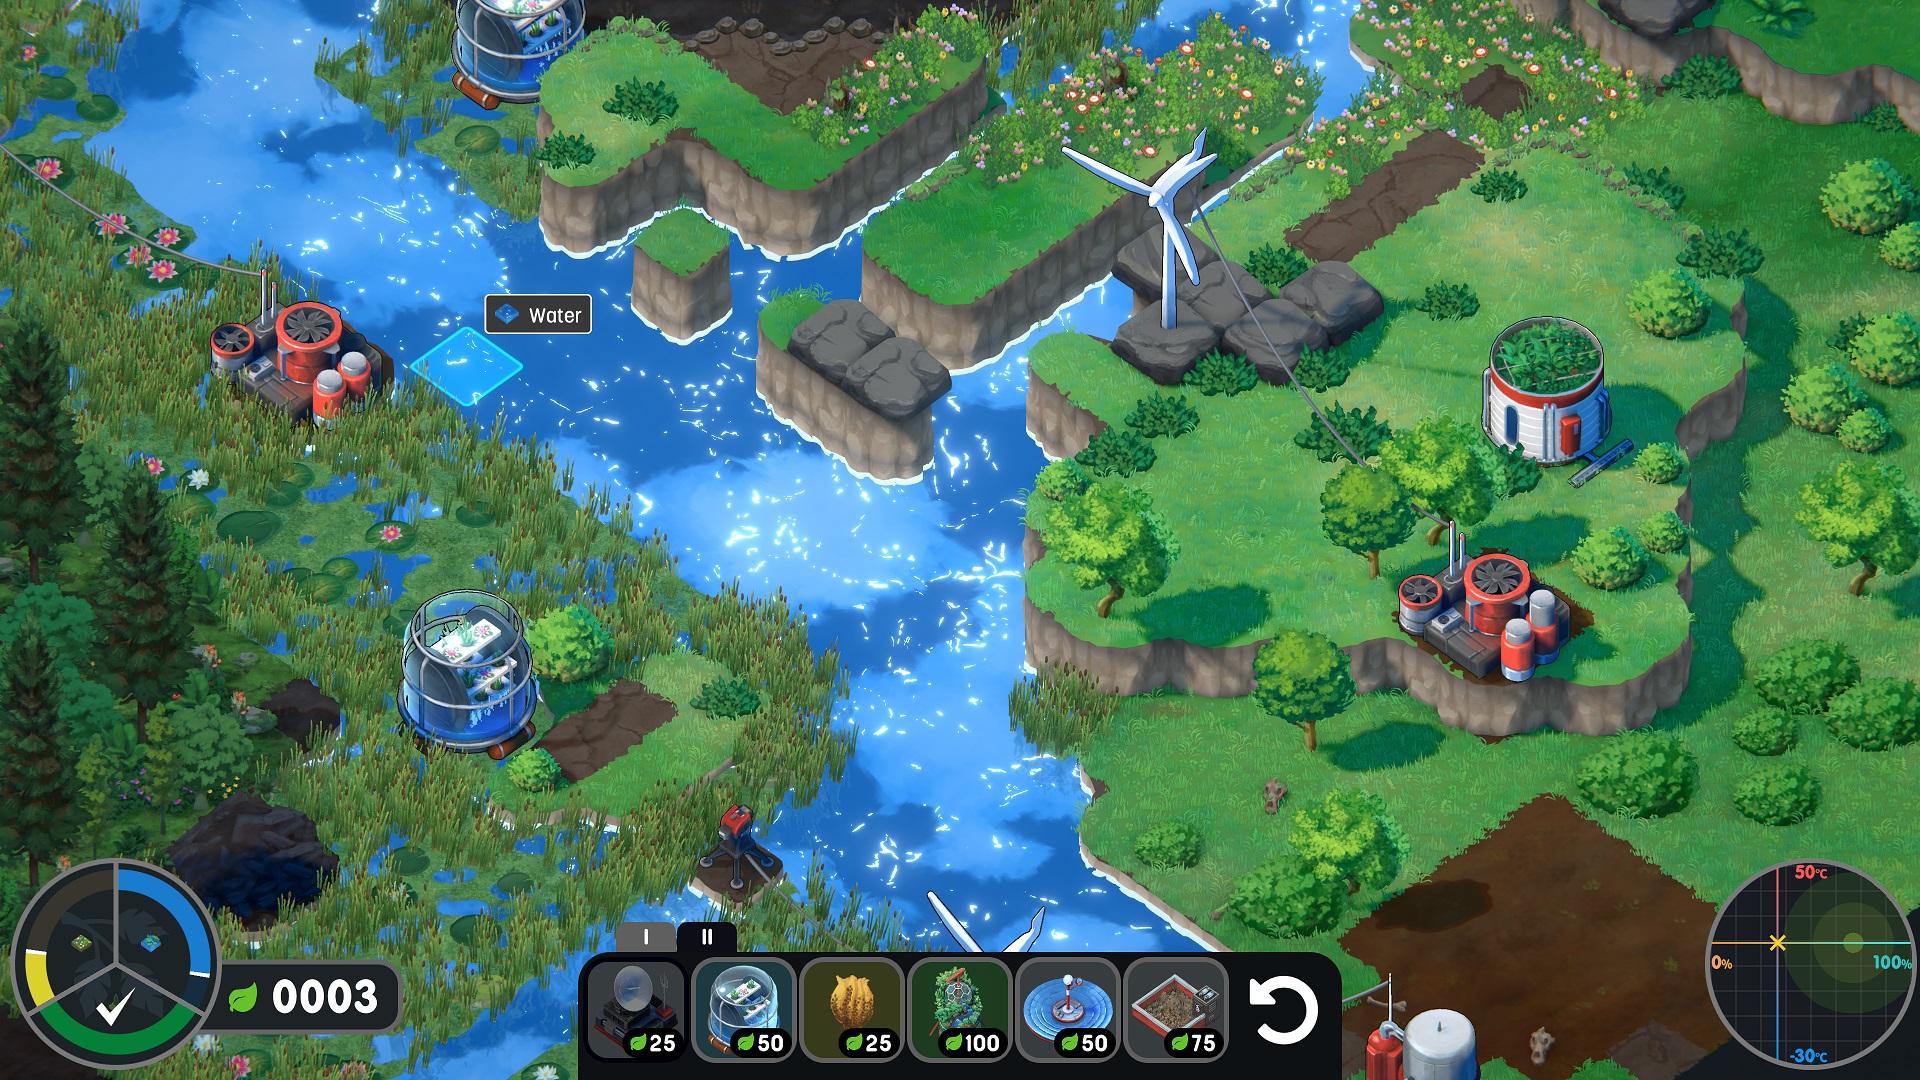 Terra Nil water screen shot